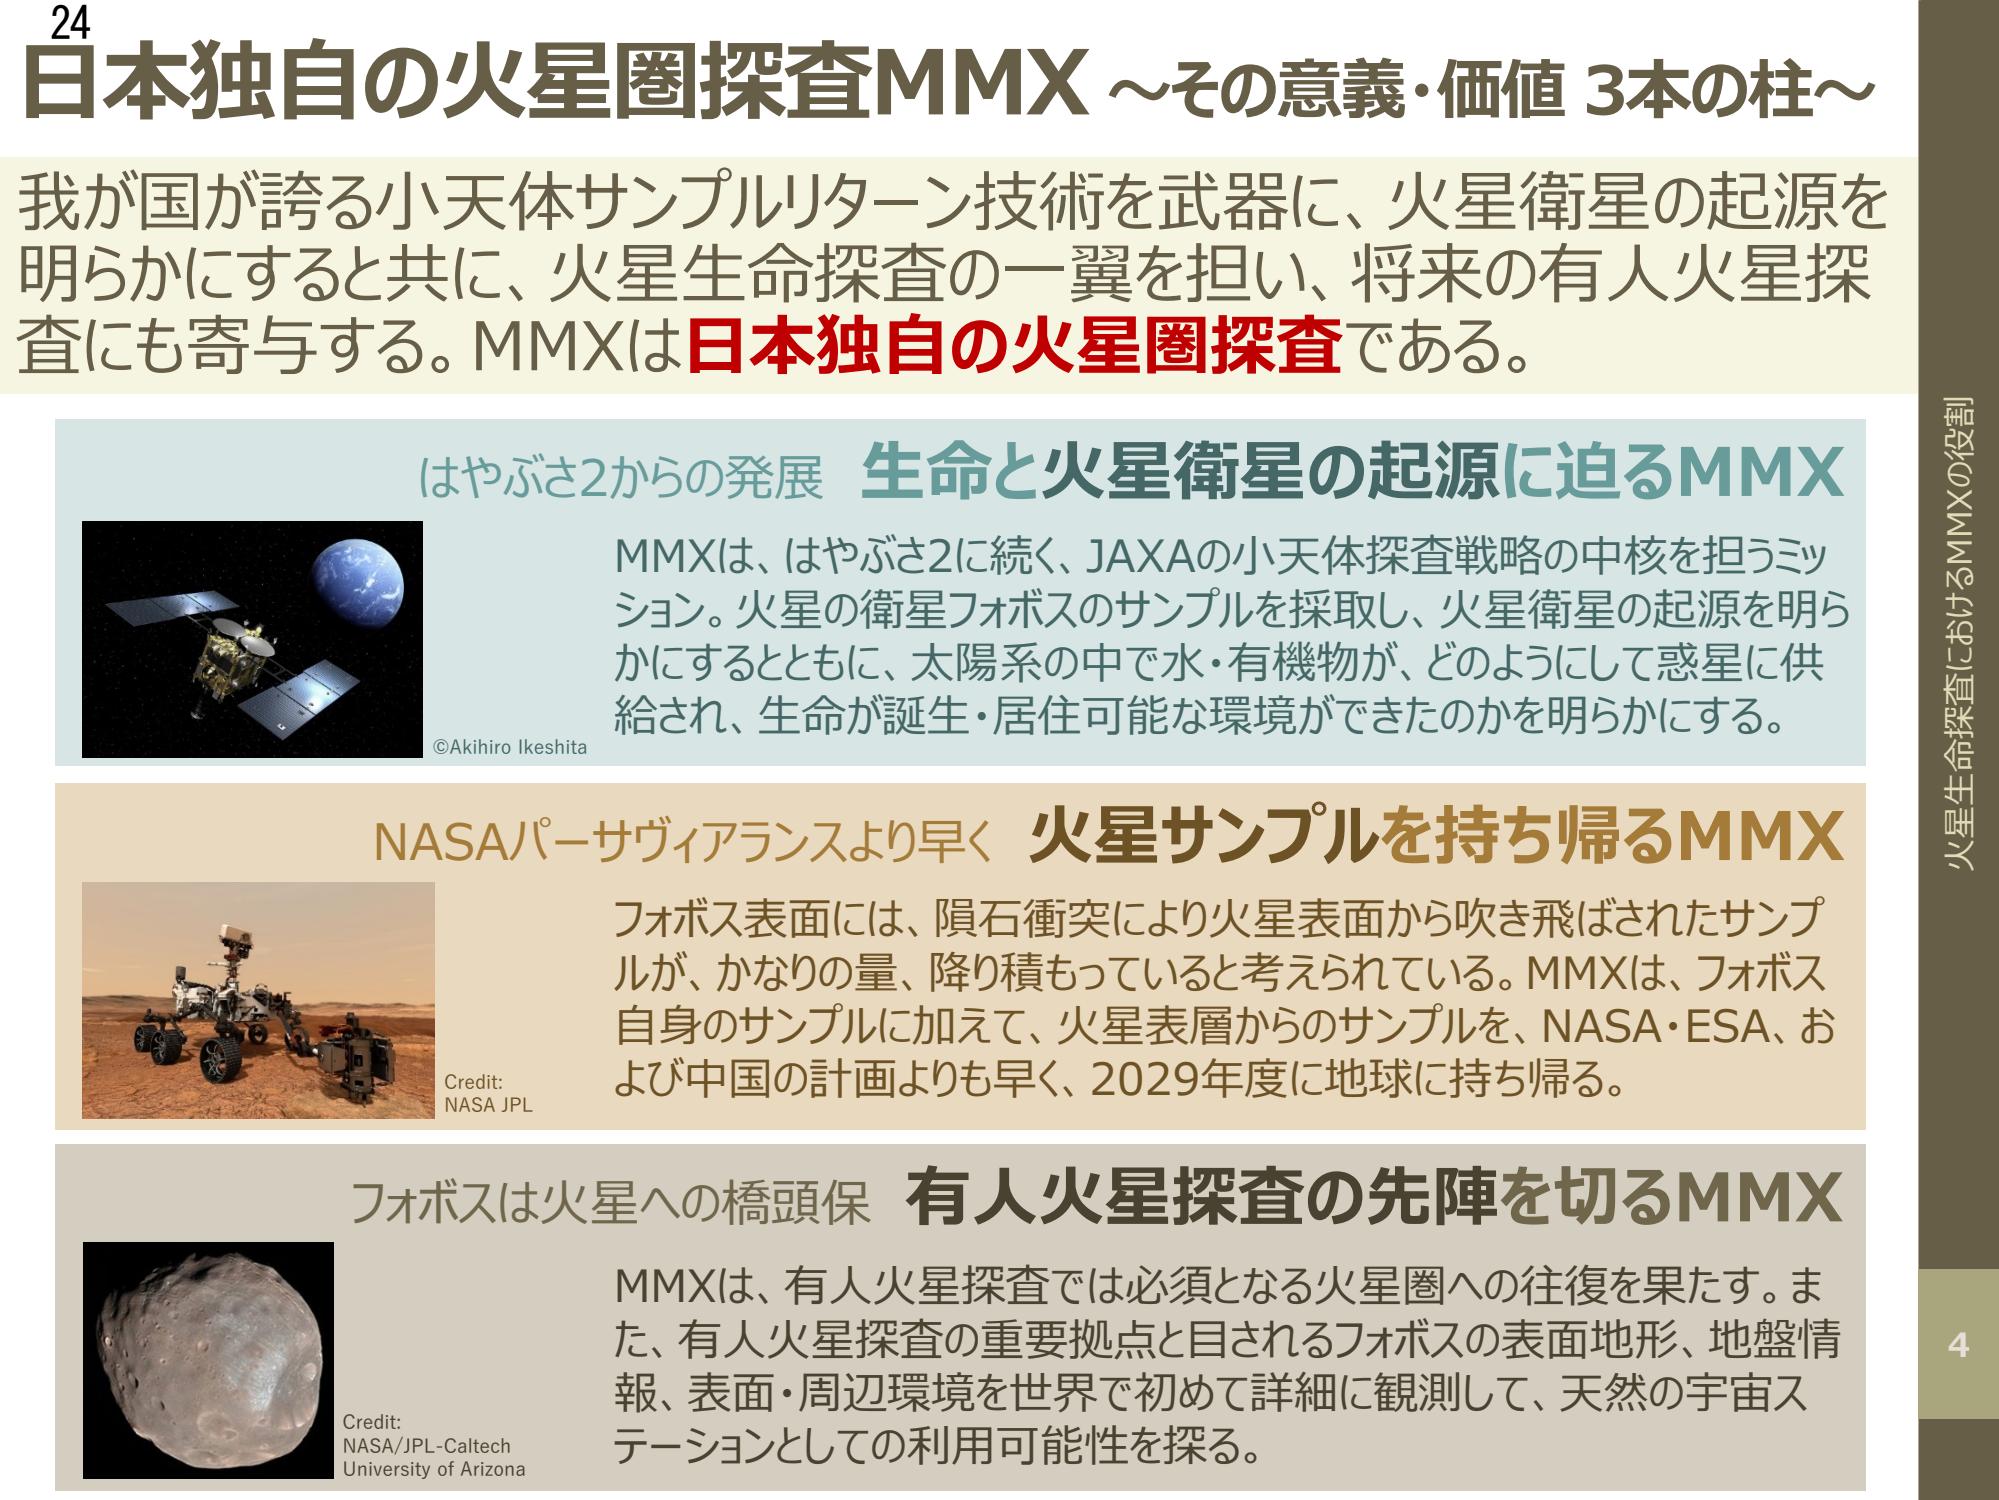 f:id:Imamura:20210819095708p:plain